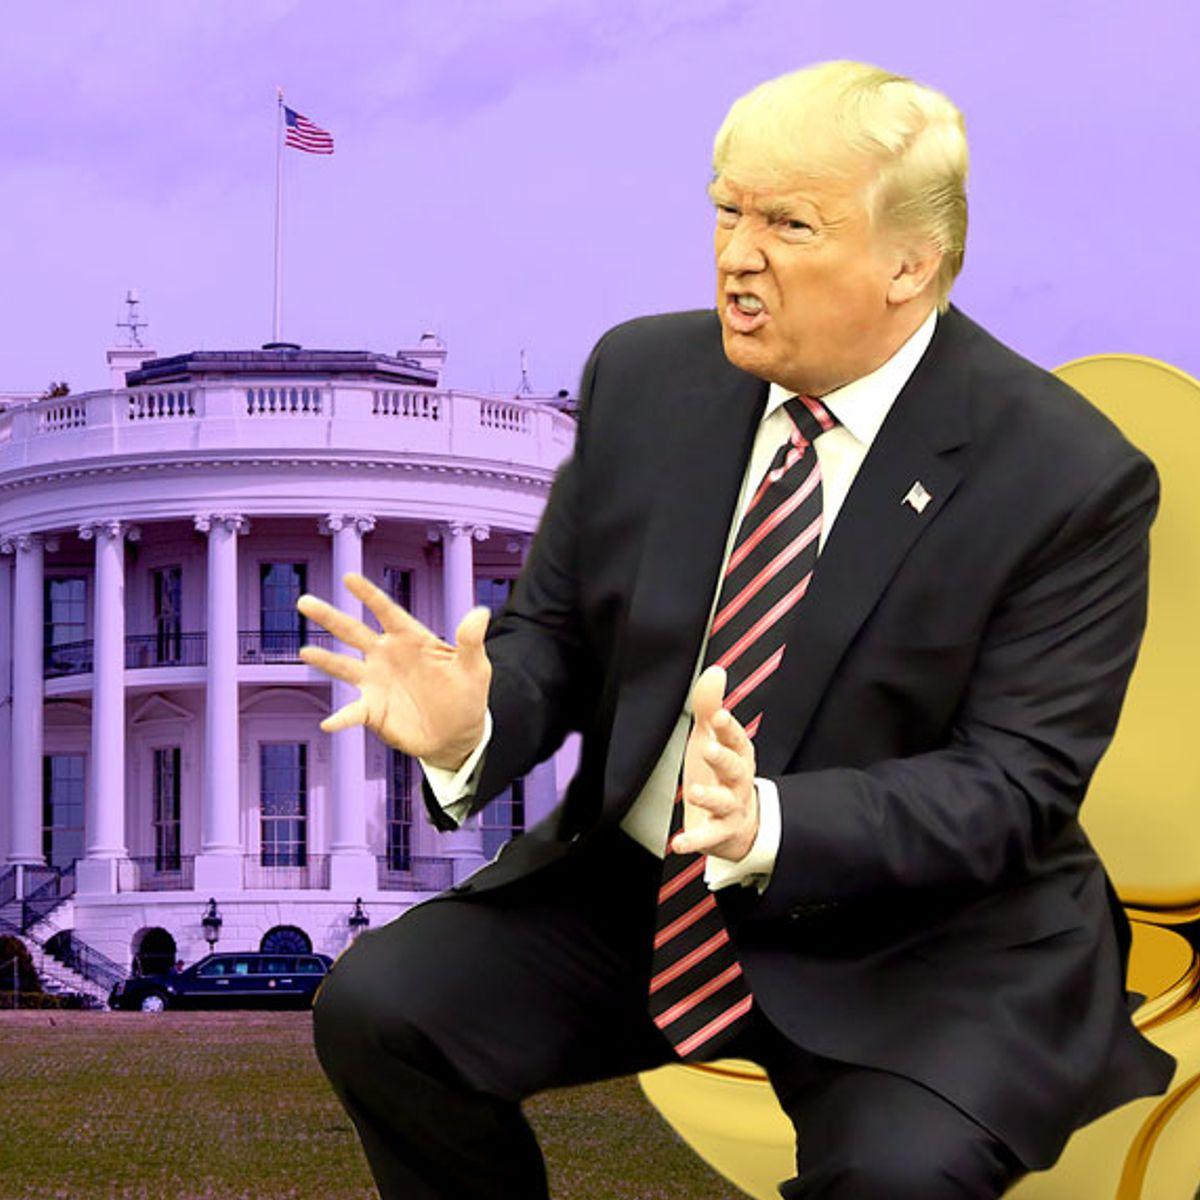 Royal flush: Understanding the power of Donald Trump's toilet politics